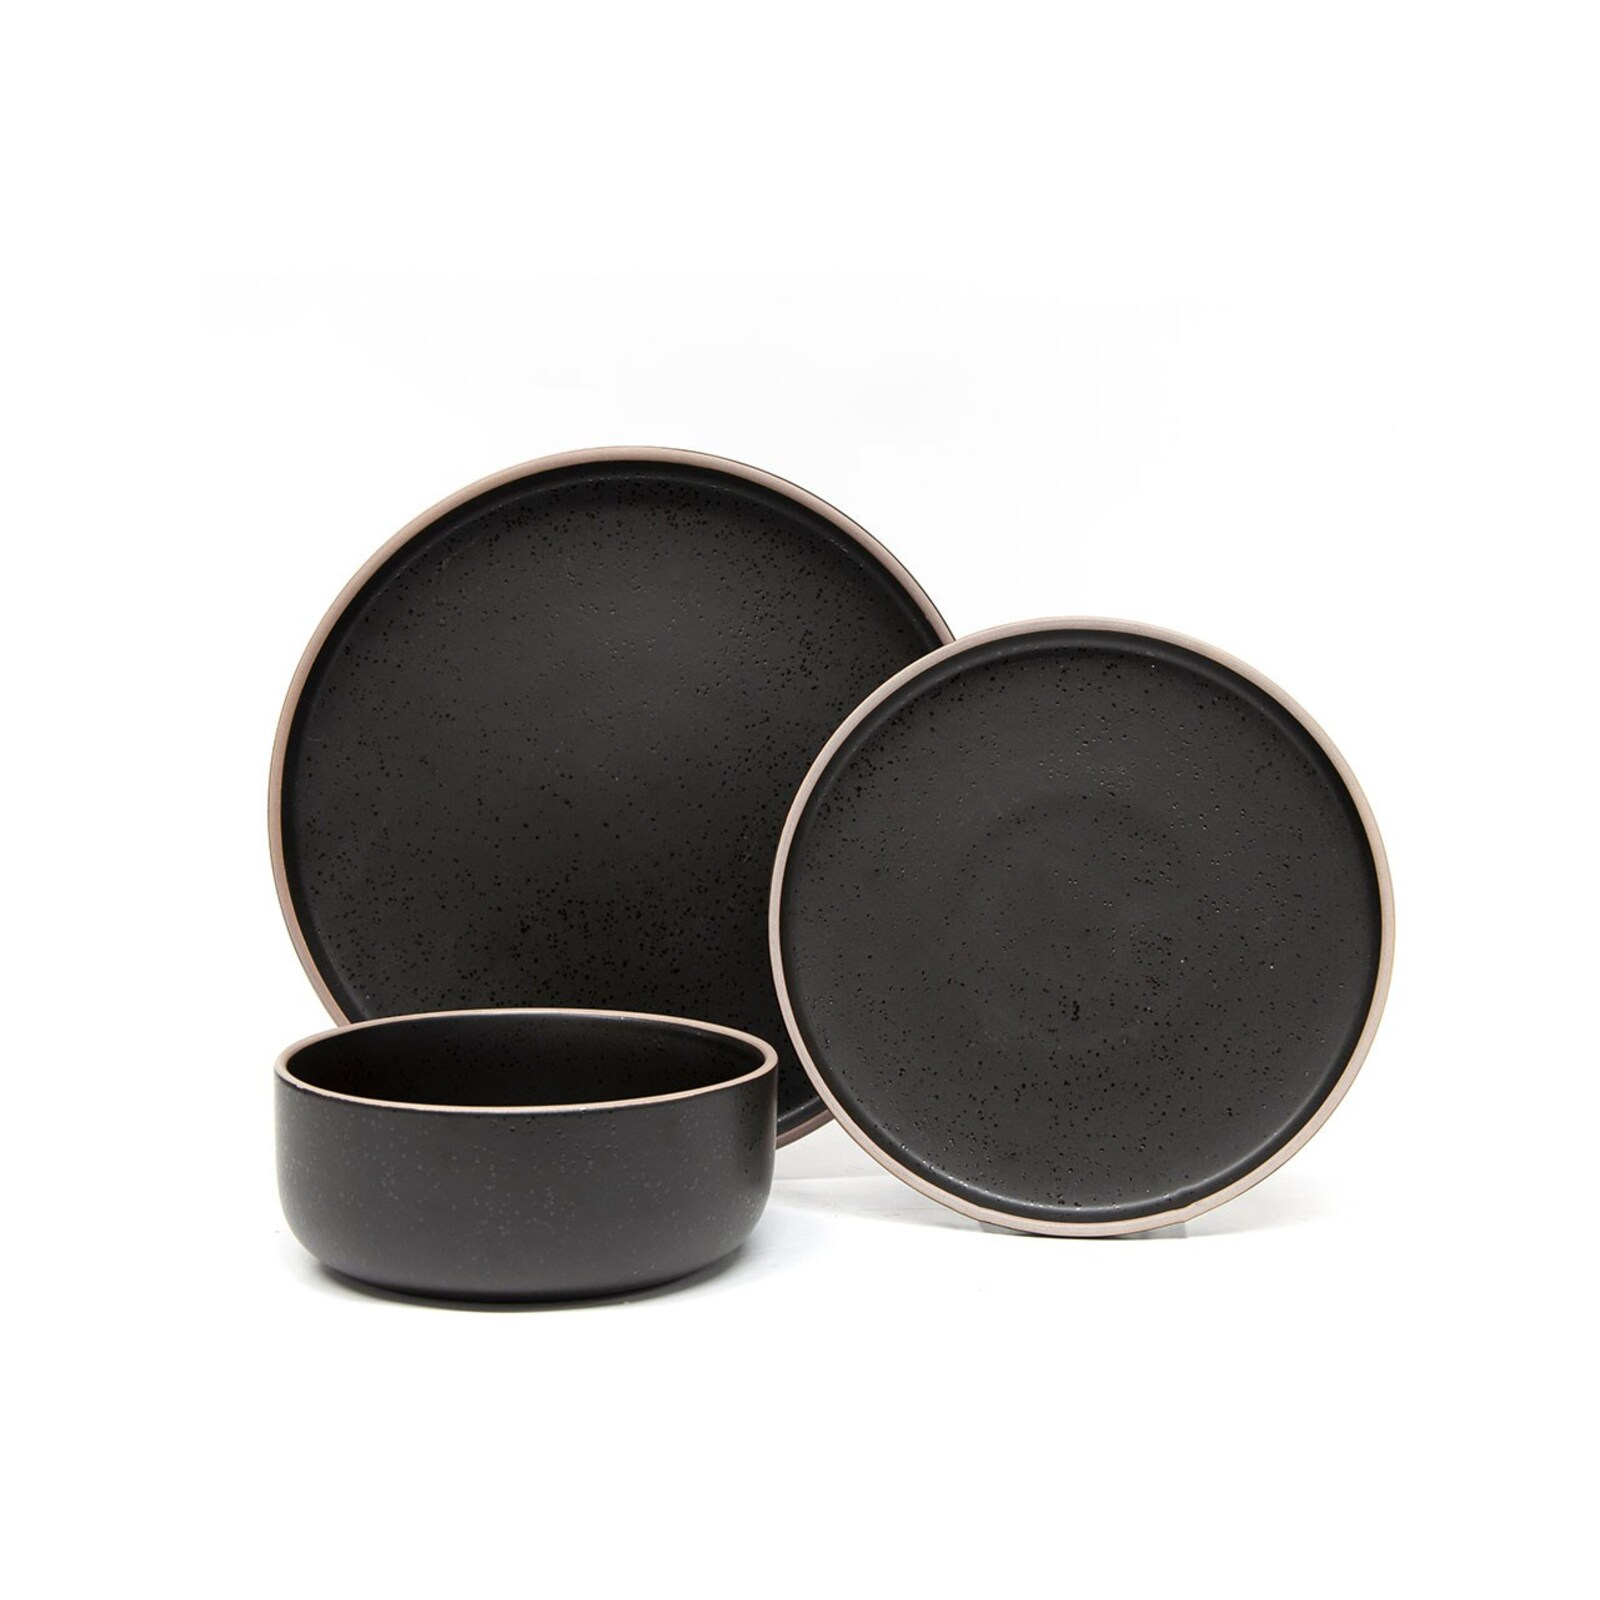 Salt & Pepper Hana 12 Piece Stoneware Dinner Set Black